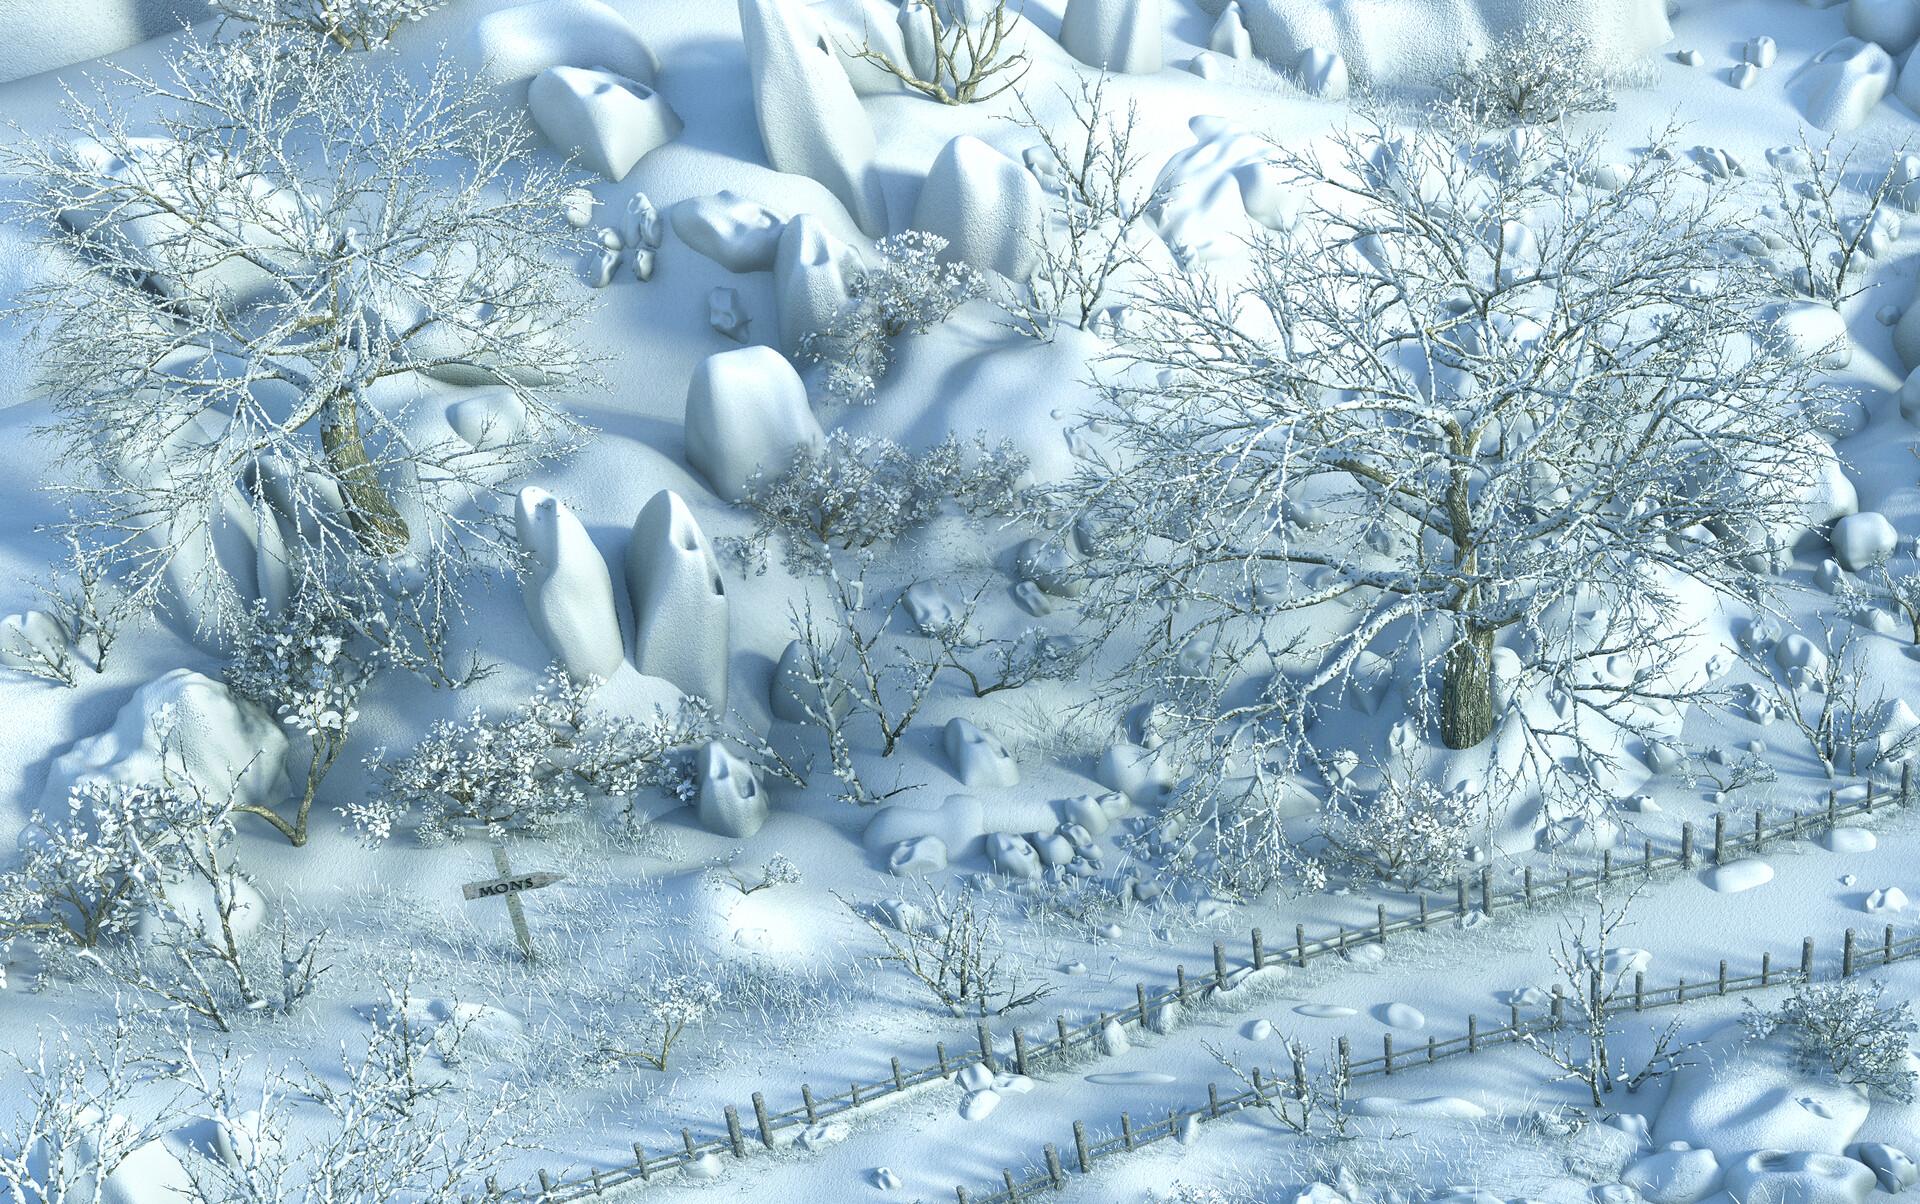 Marc mons snow7